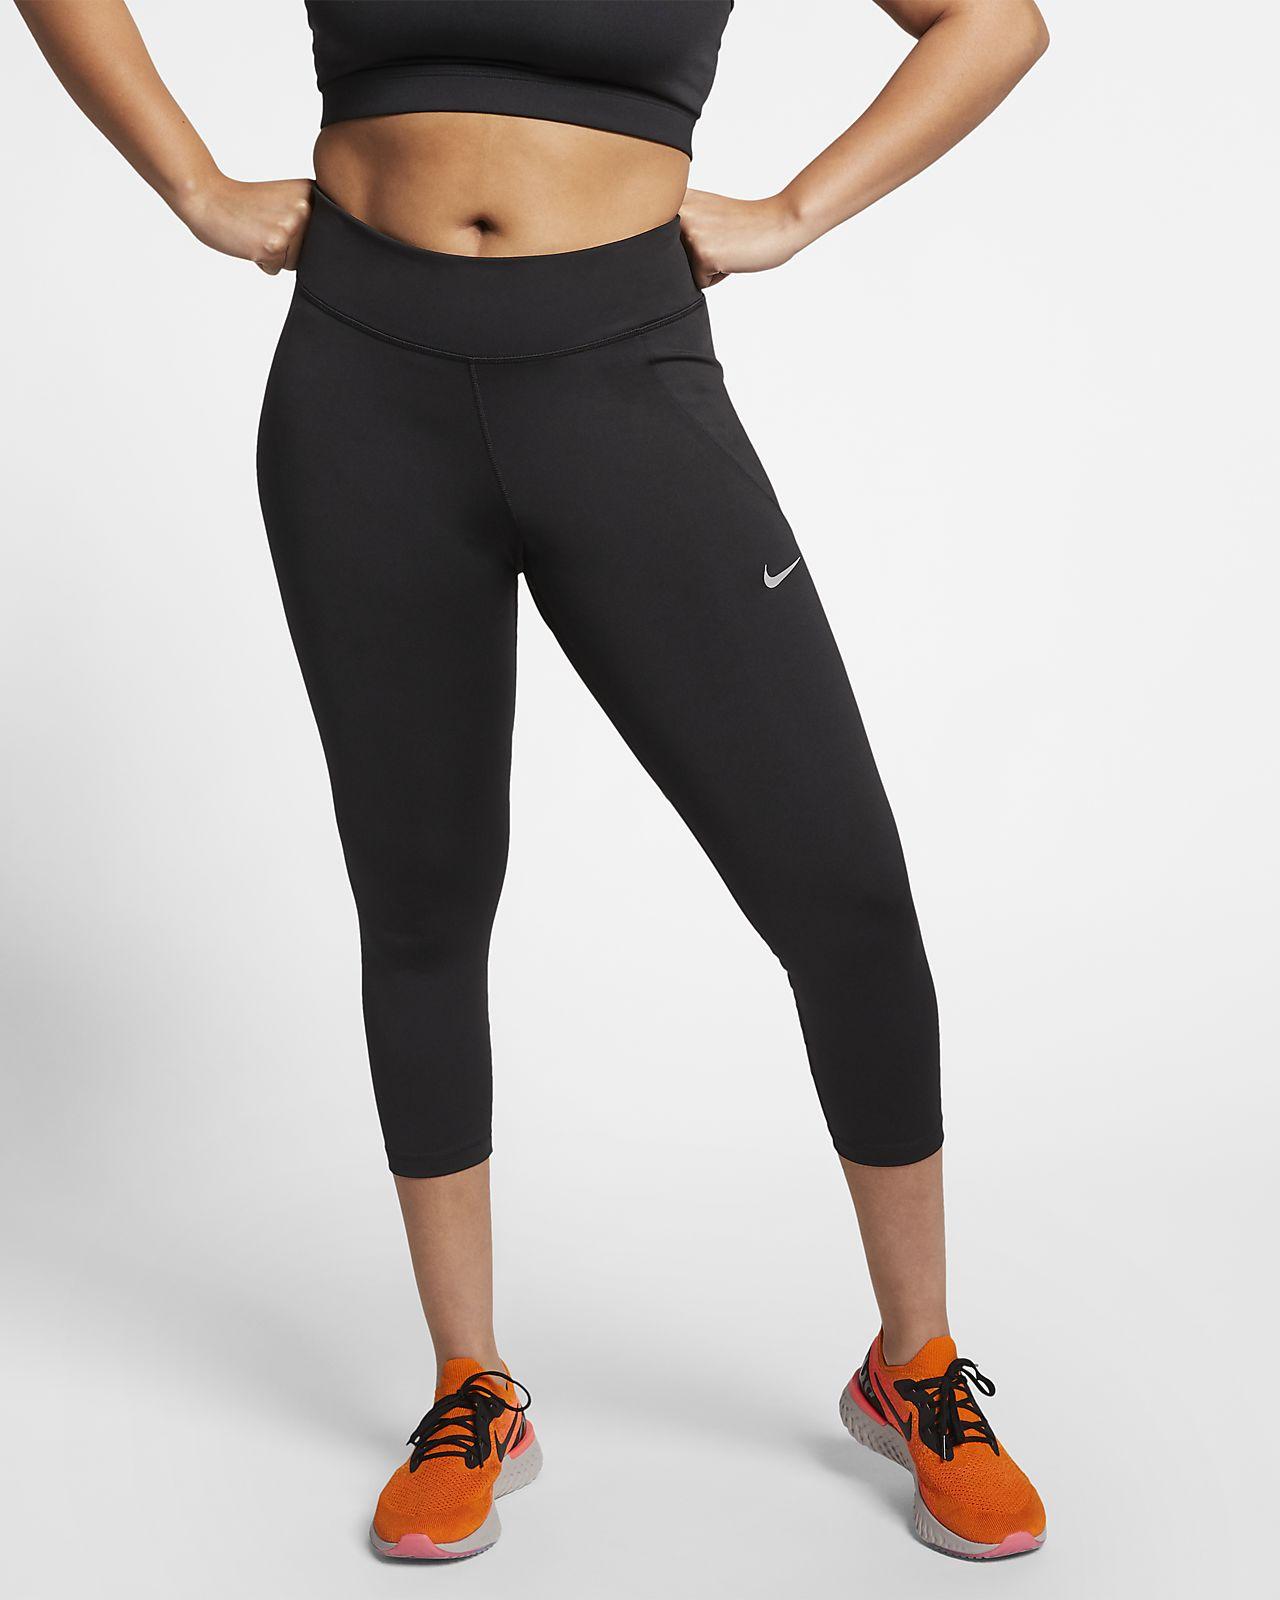 Nike Fast 3/4-hardloopbroek voor dames (grote maten)